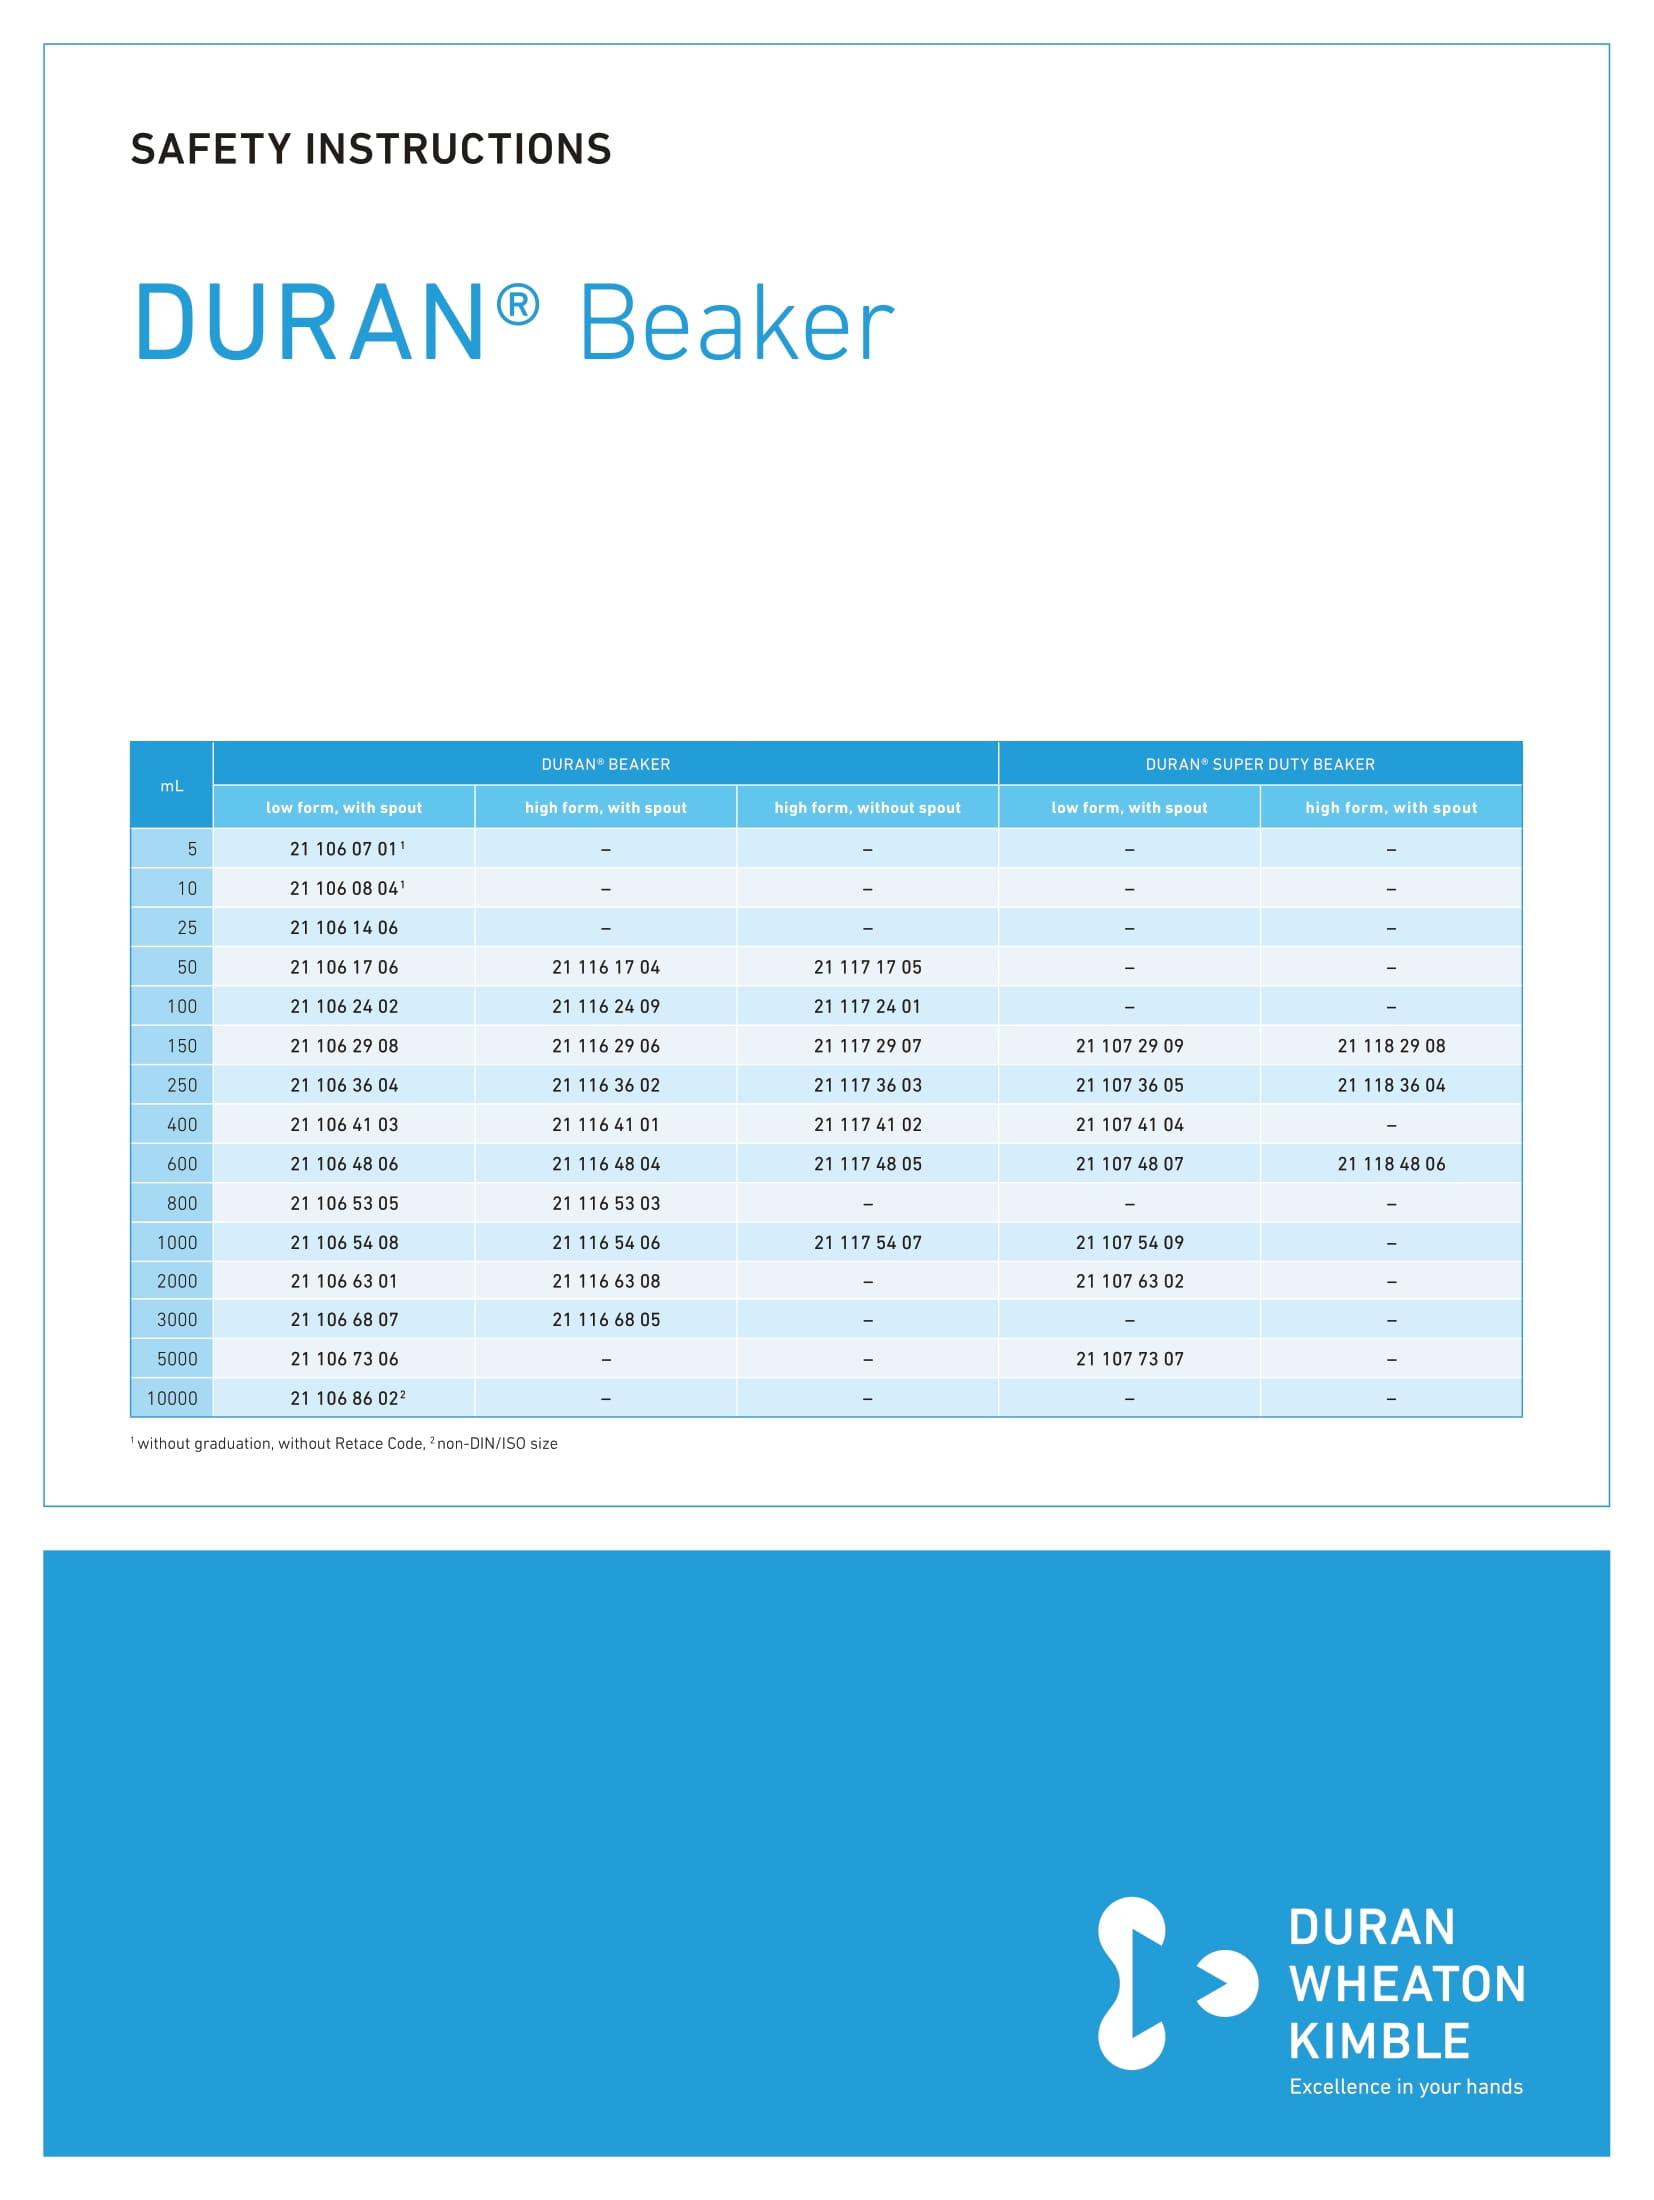 DWK SAFETY INSTRUCTIONS DURAN® Beaker